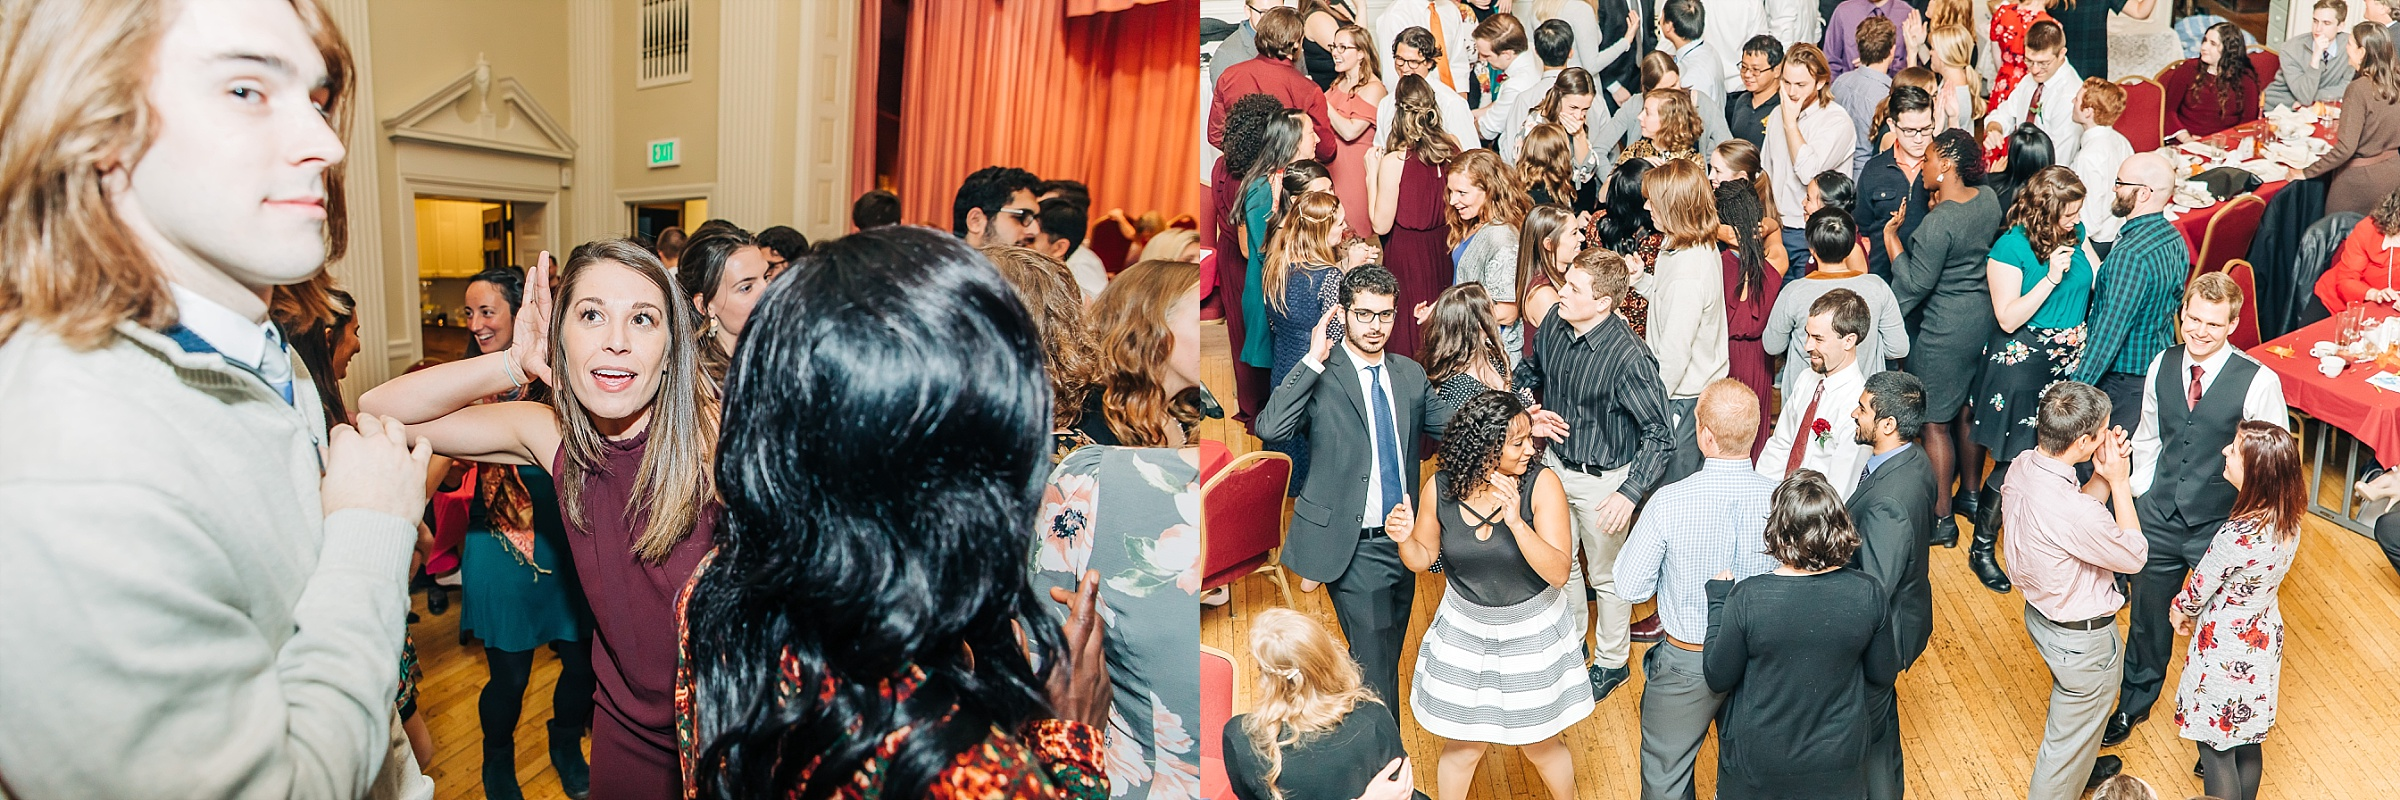 west lafayette indiana wedding photographer church duncan hall_0196.jpg